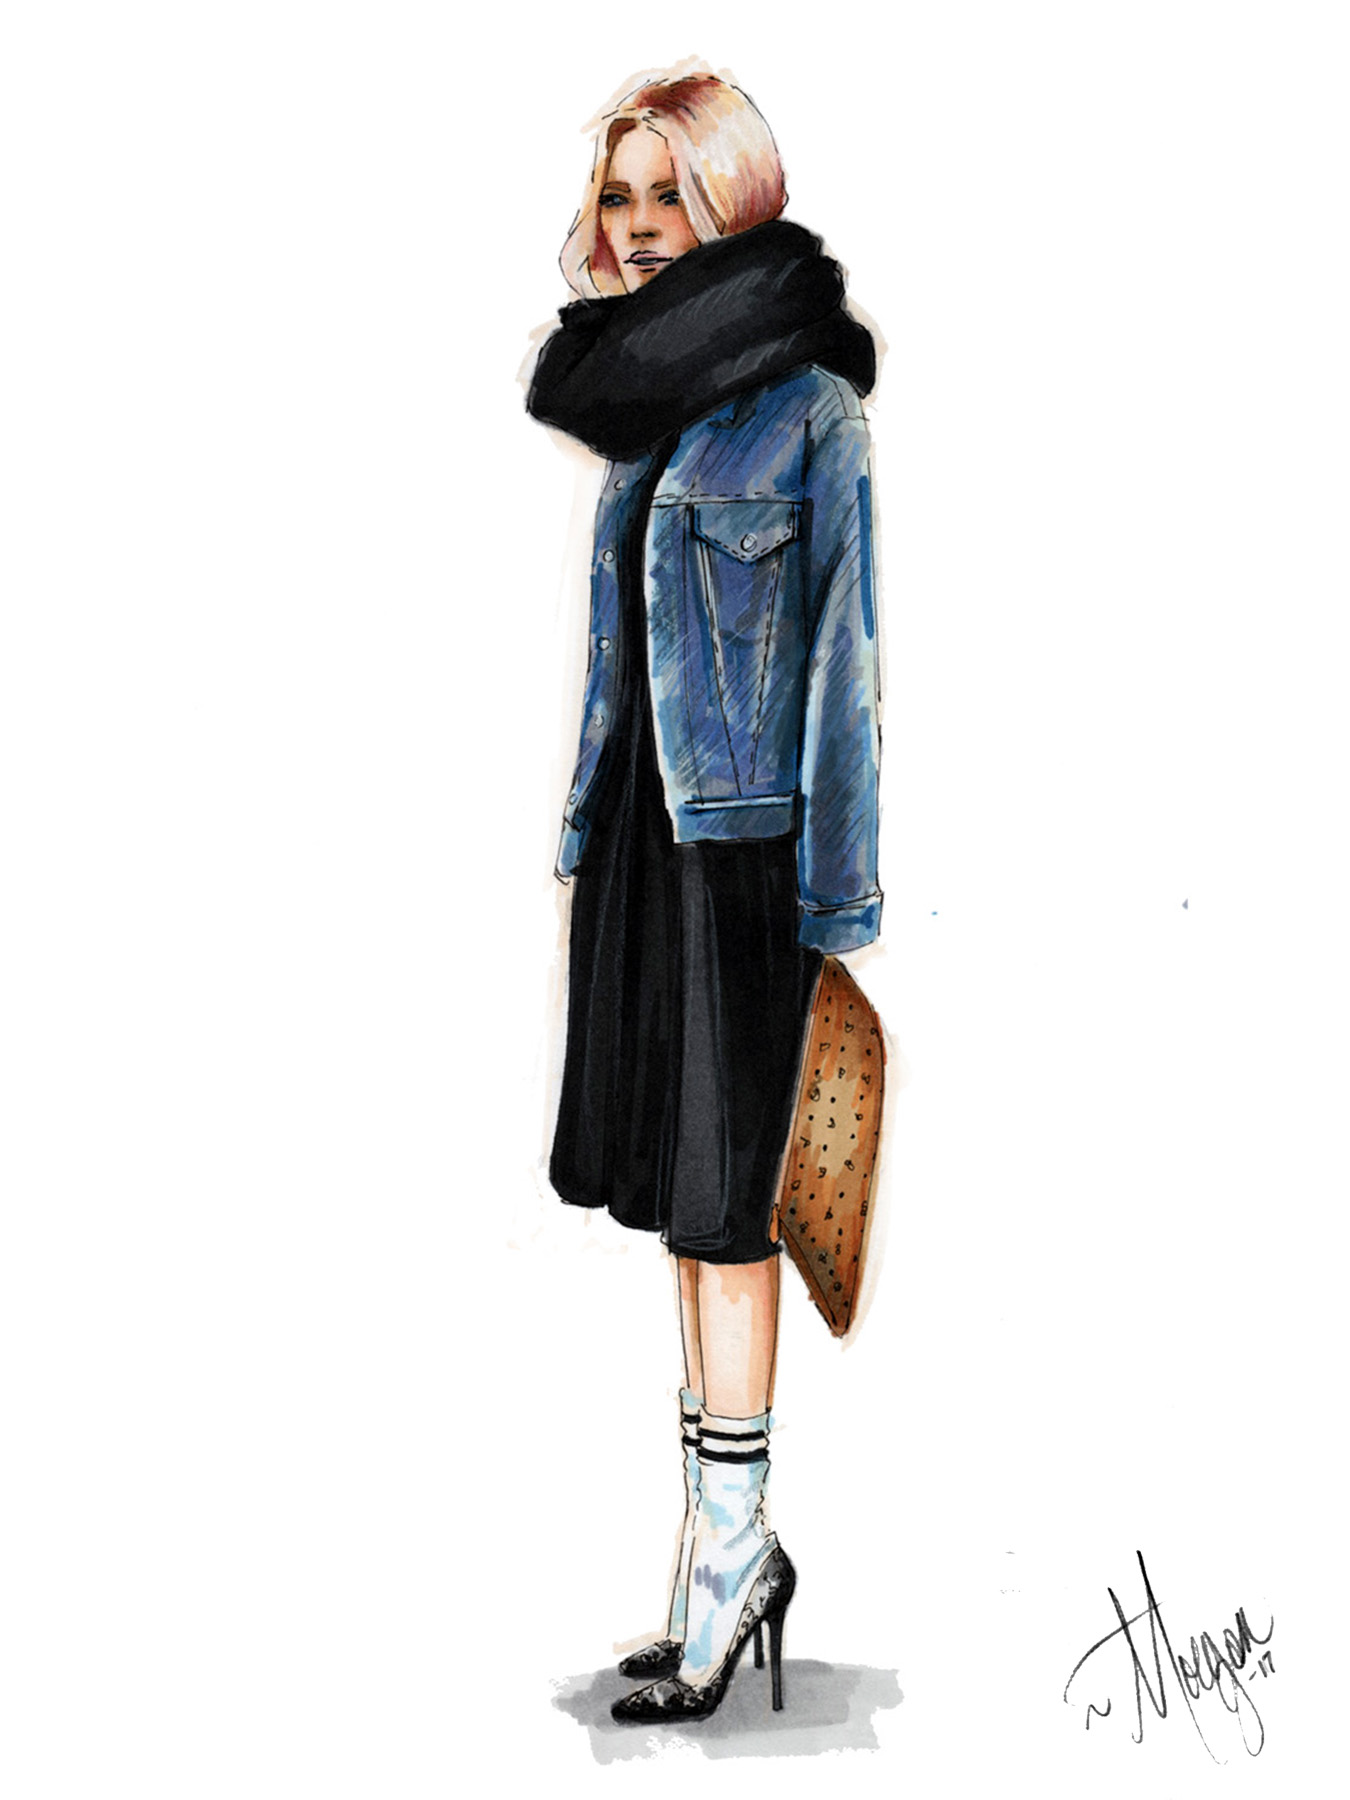 denim-jacket-illustration-morgan-swank-studio.jpg